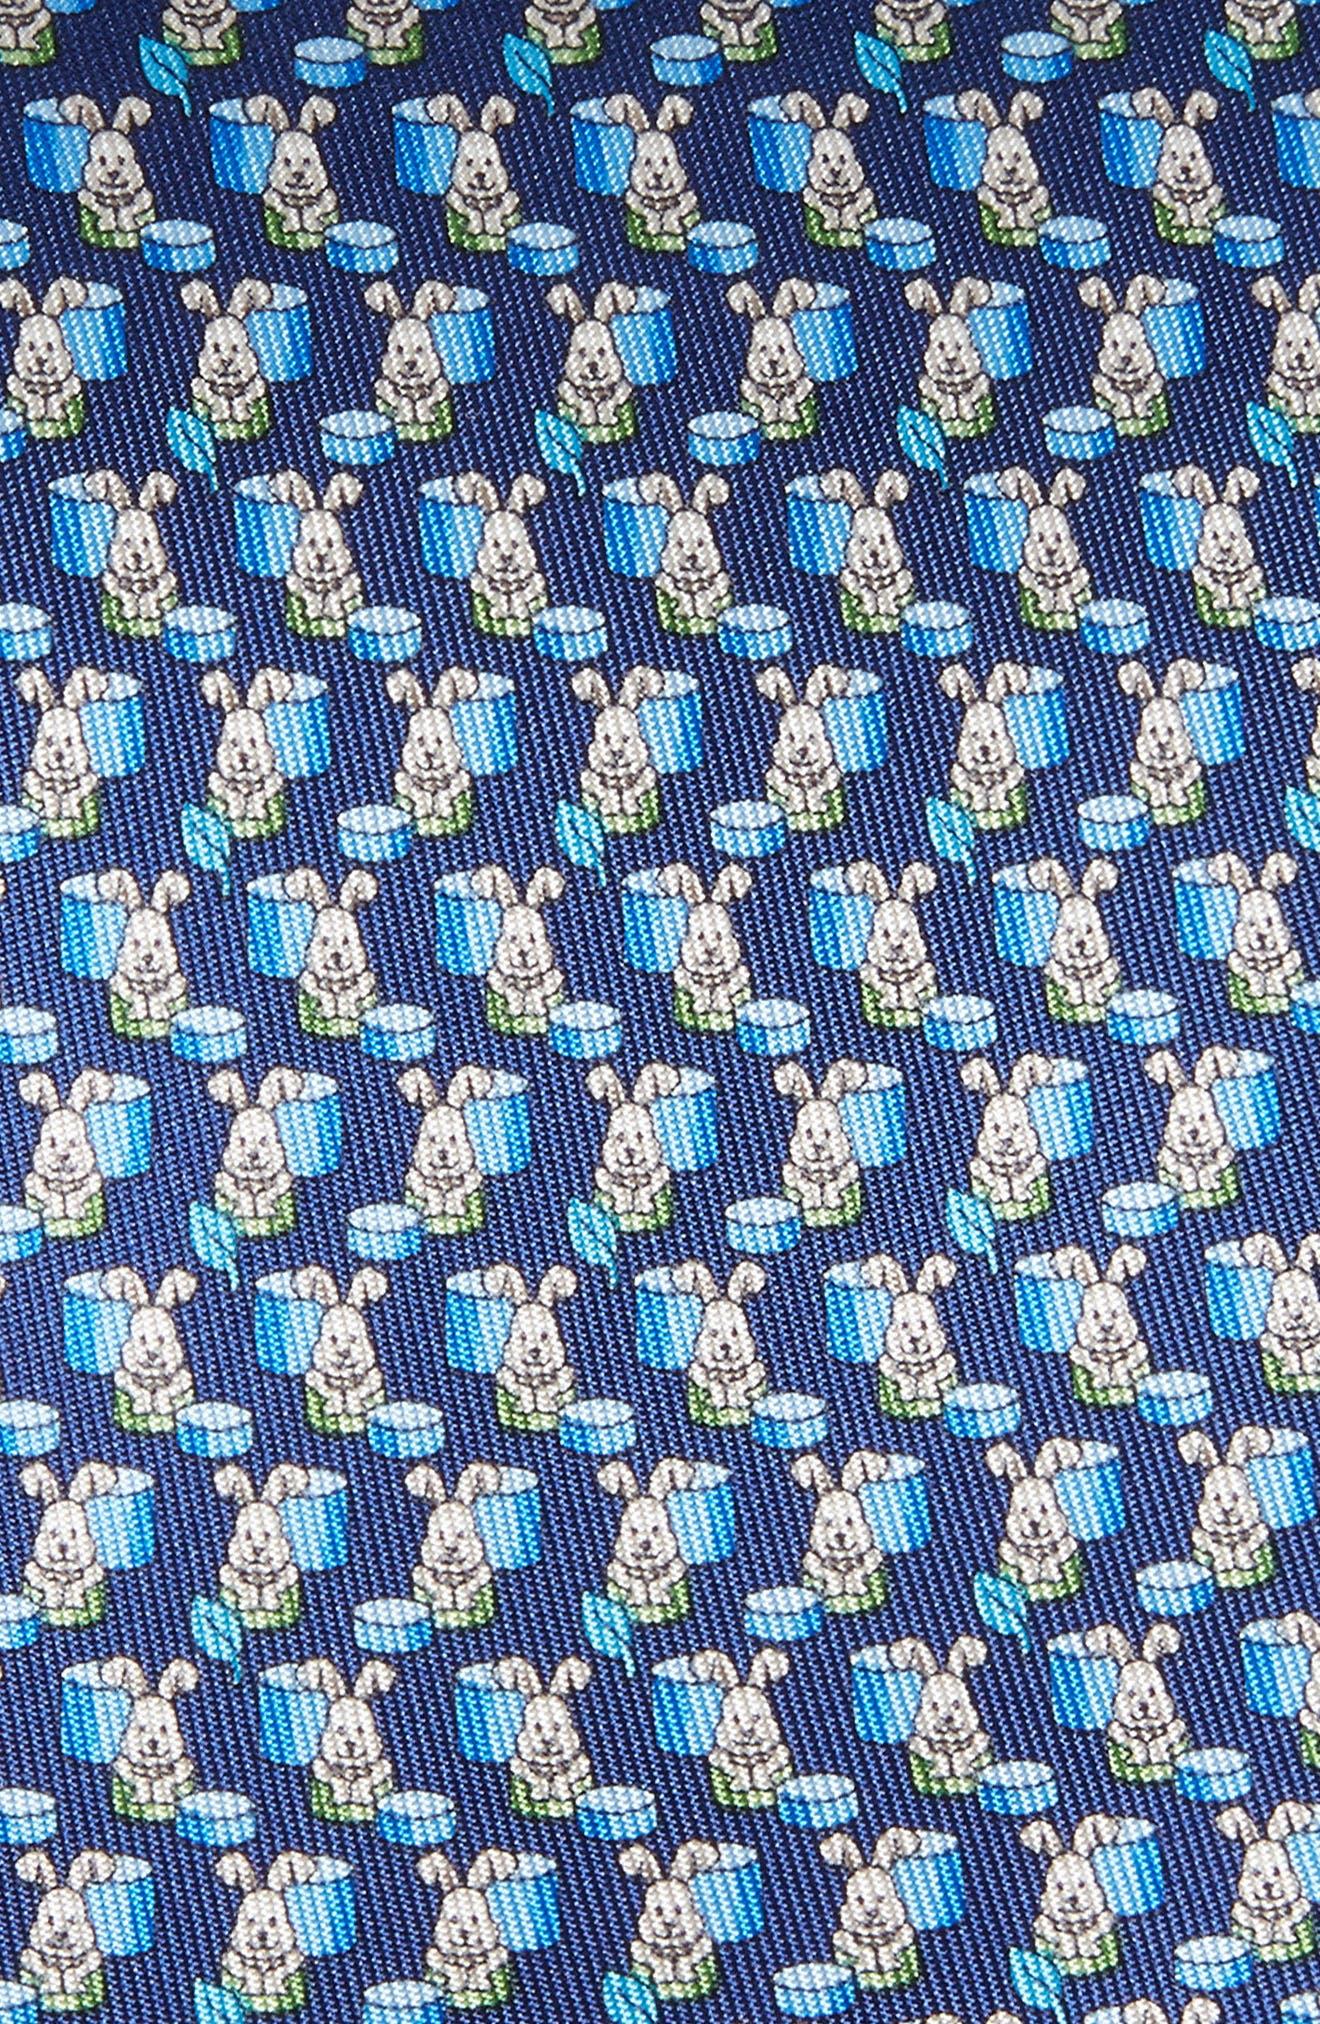 Bunny Print Silk Tie,                             Alternate thumbnail 2, color,                             430